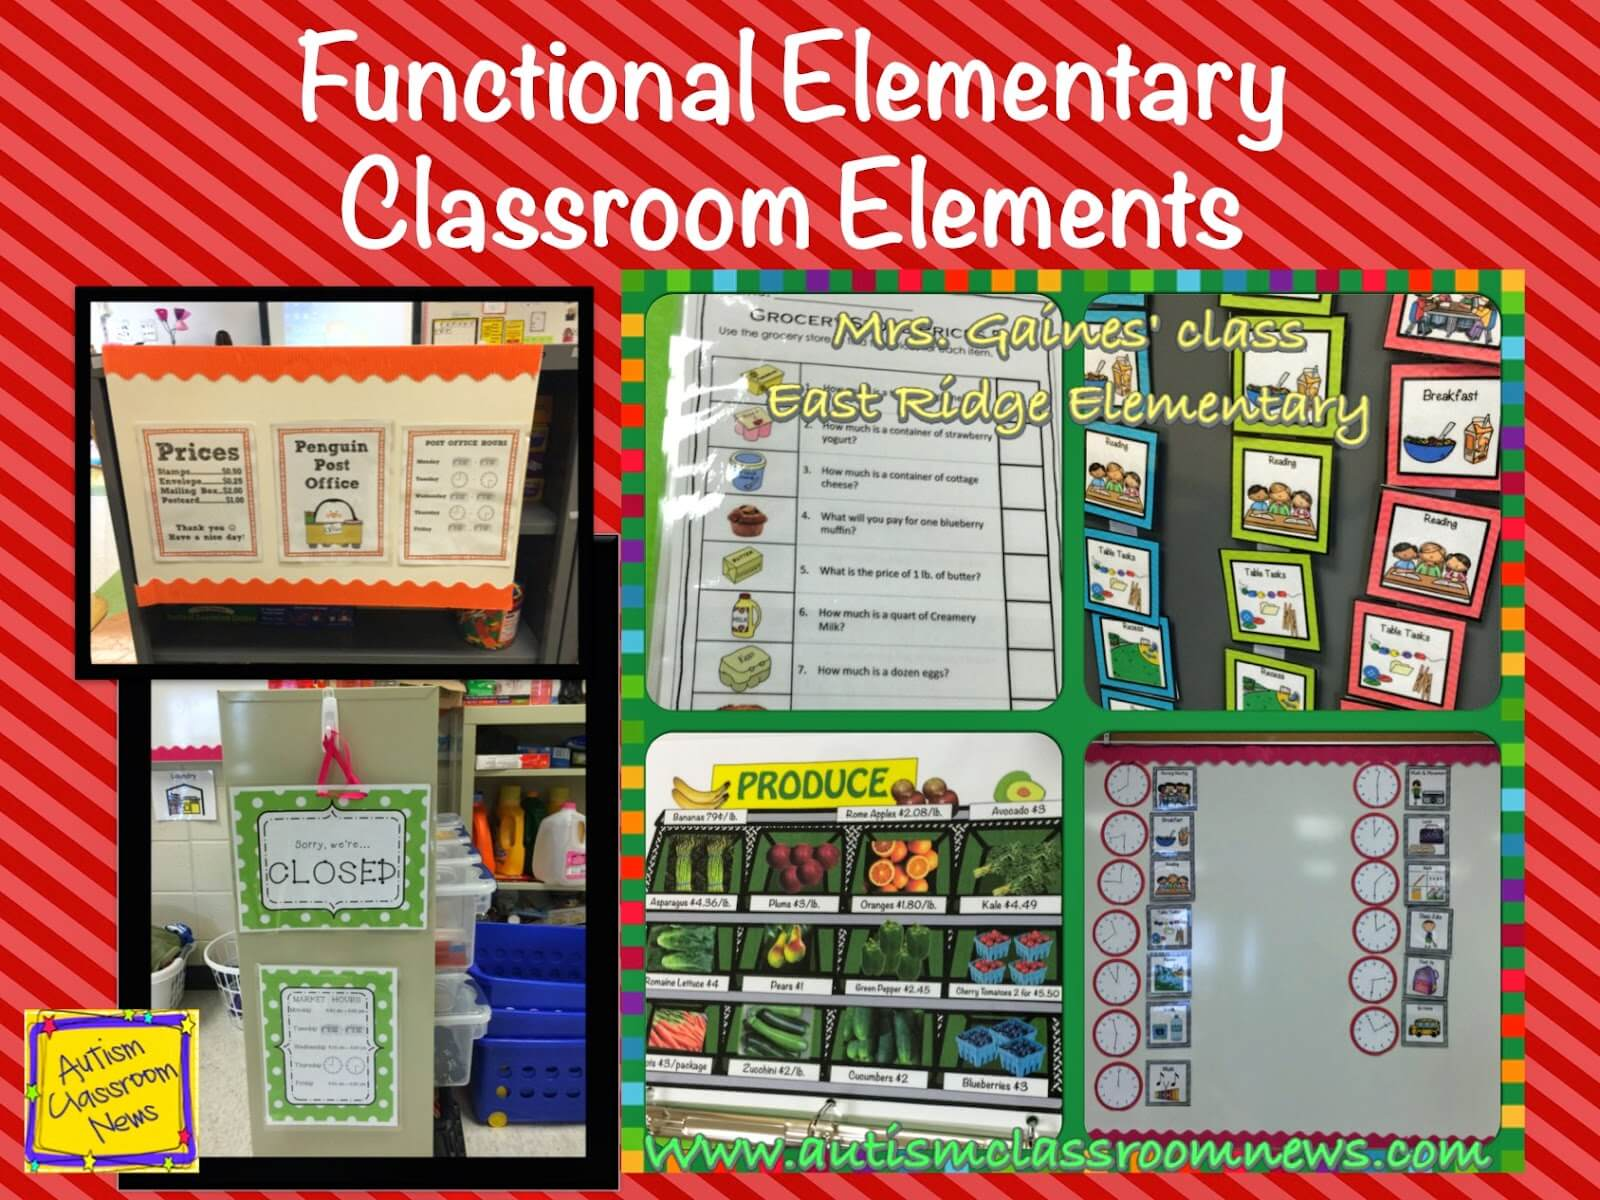 Elementary Classroom Setup Ideas ~ Functional elementary classroom elements autism